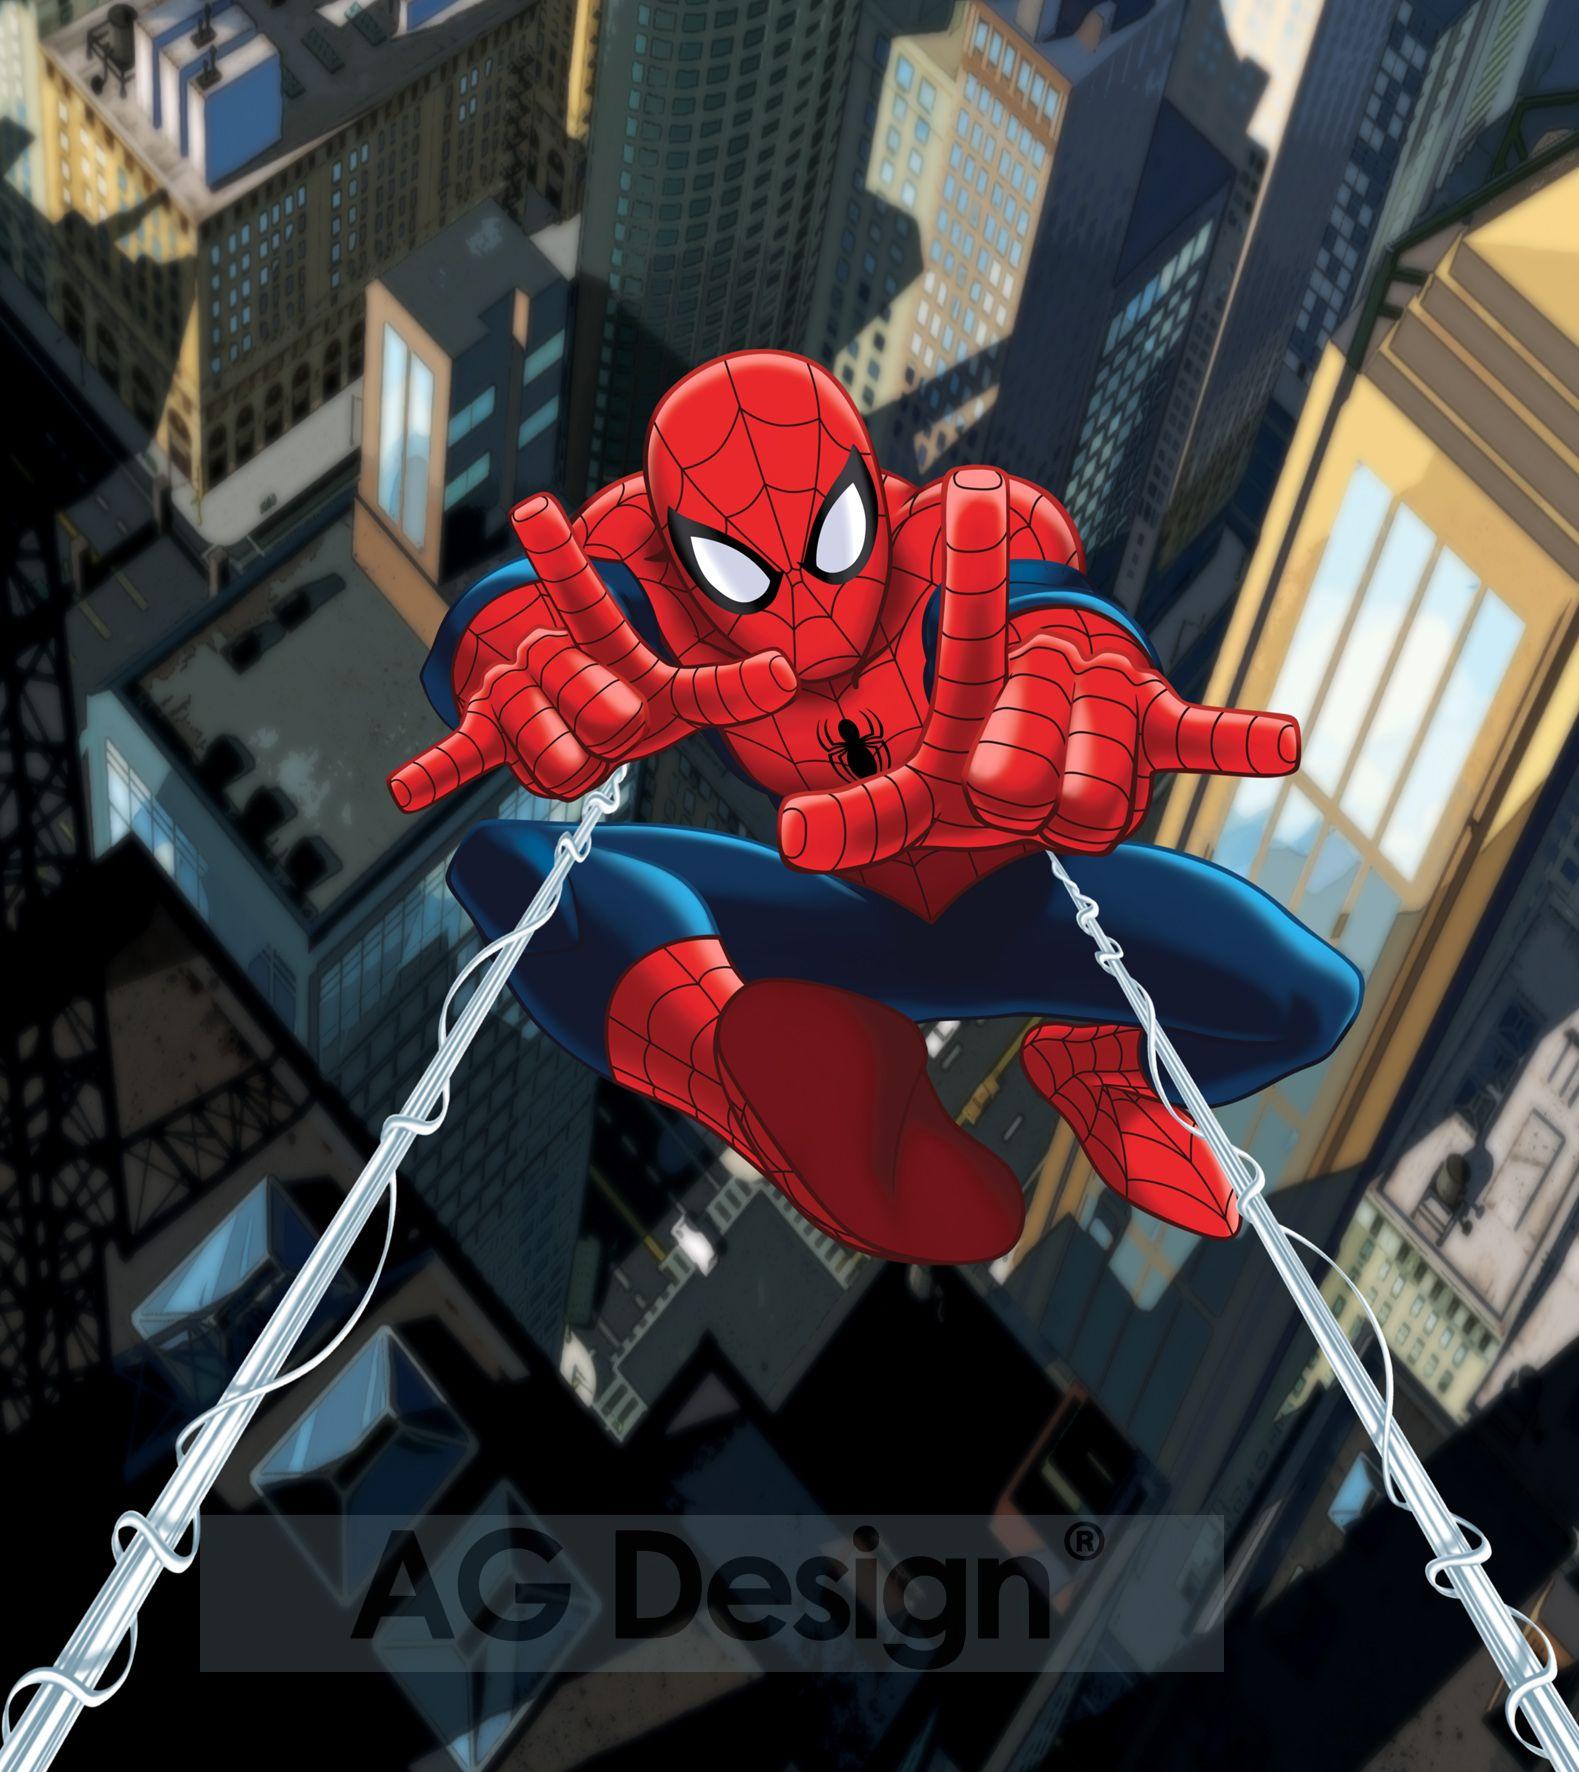 Fototapeta dvoudílná - Spiderman